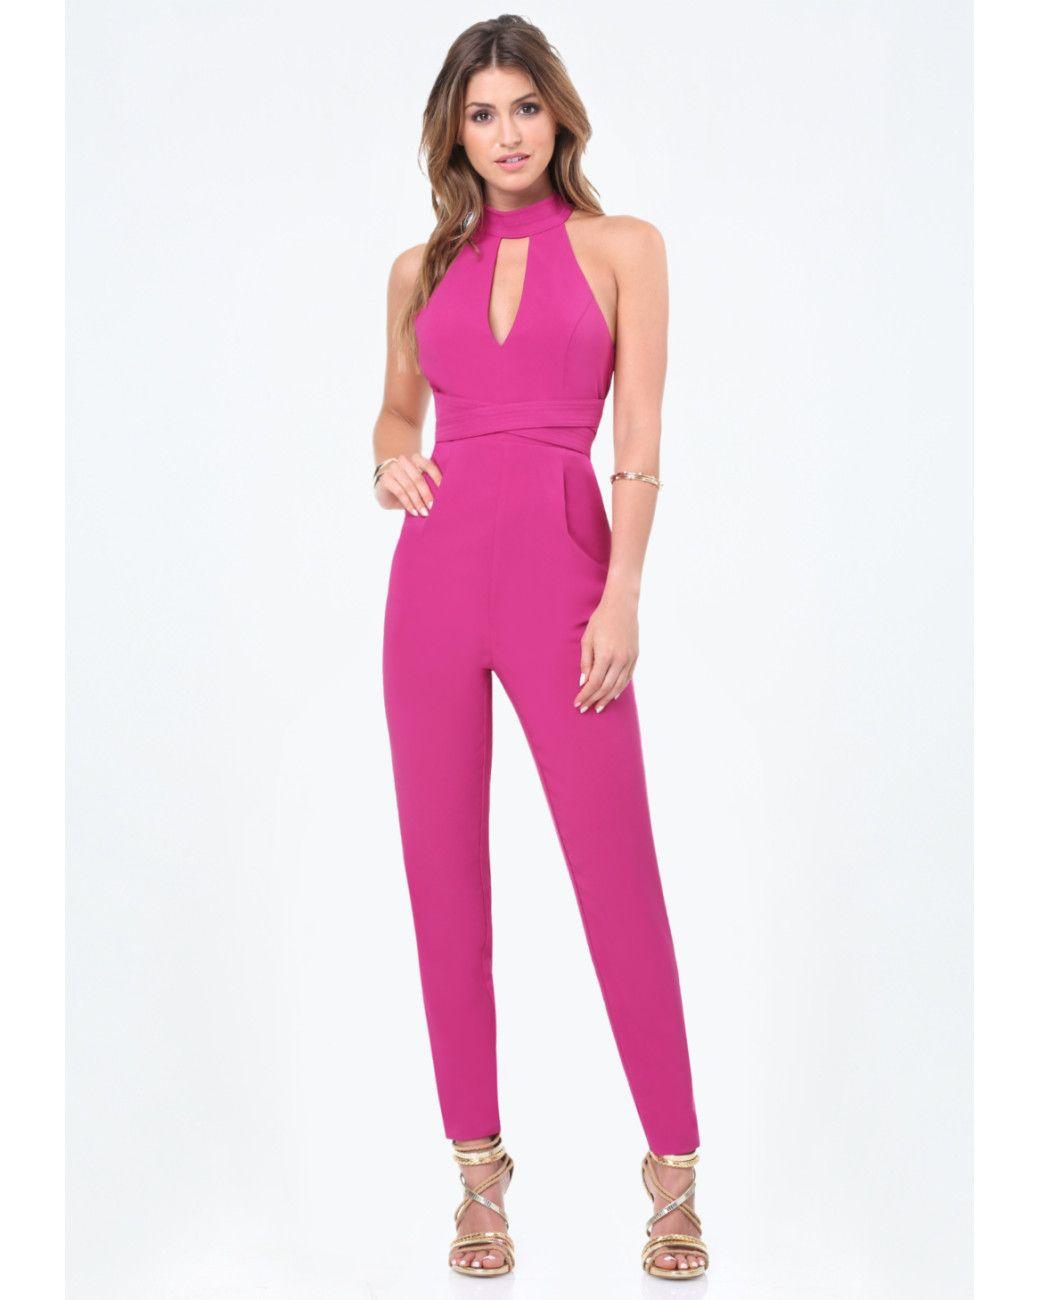 4839857cfc83 Women s Pink Jagger Mock Neck Jumpsuit